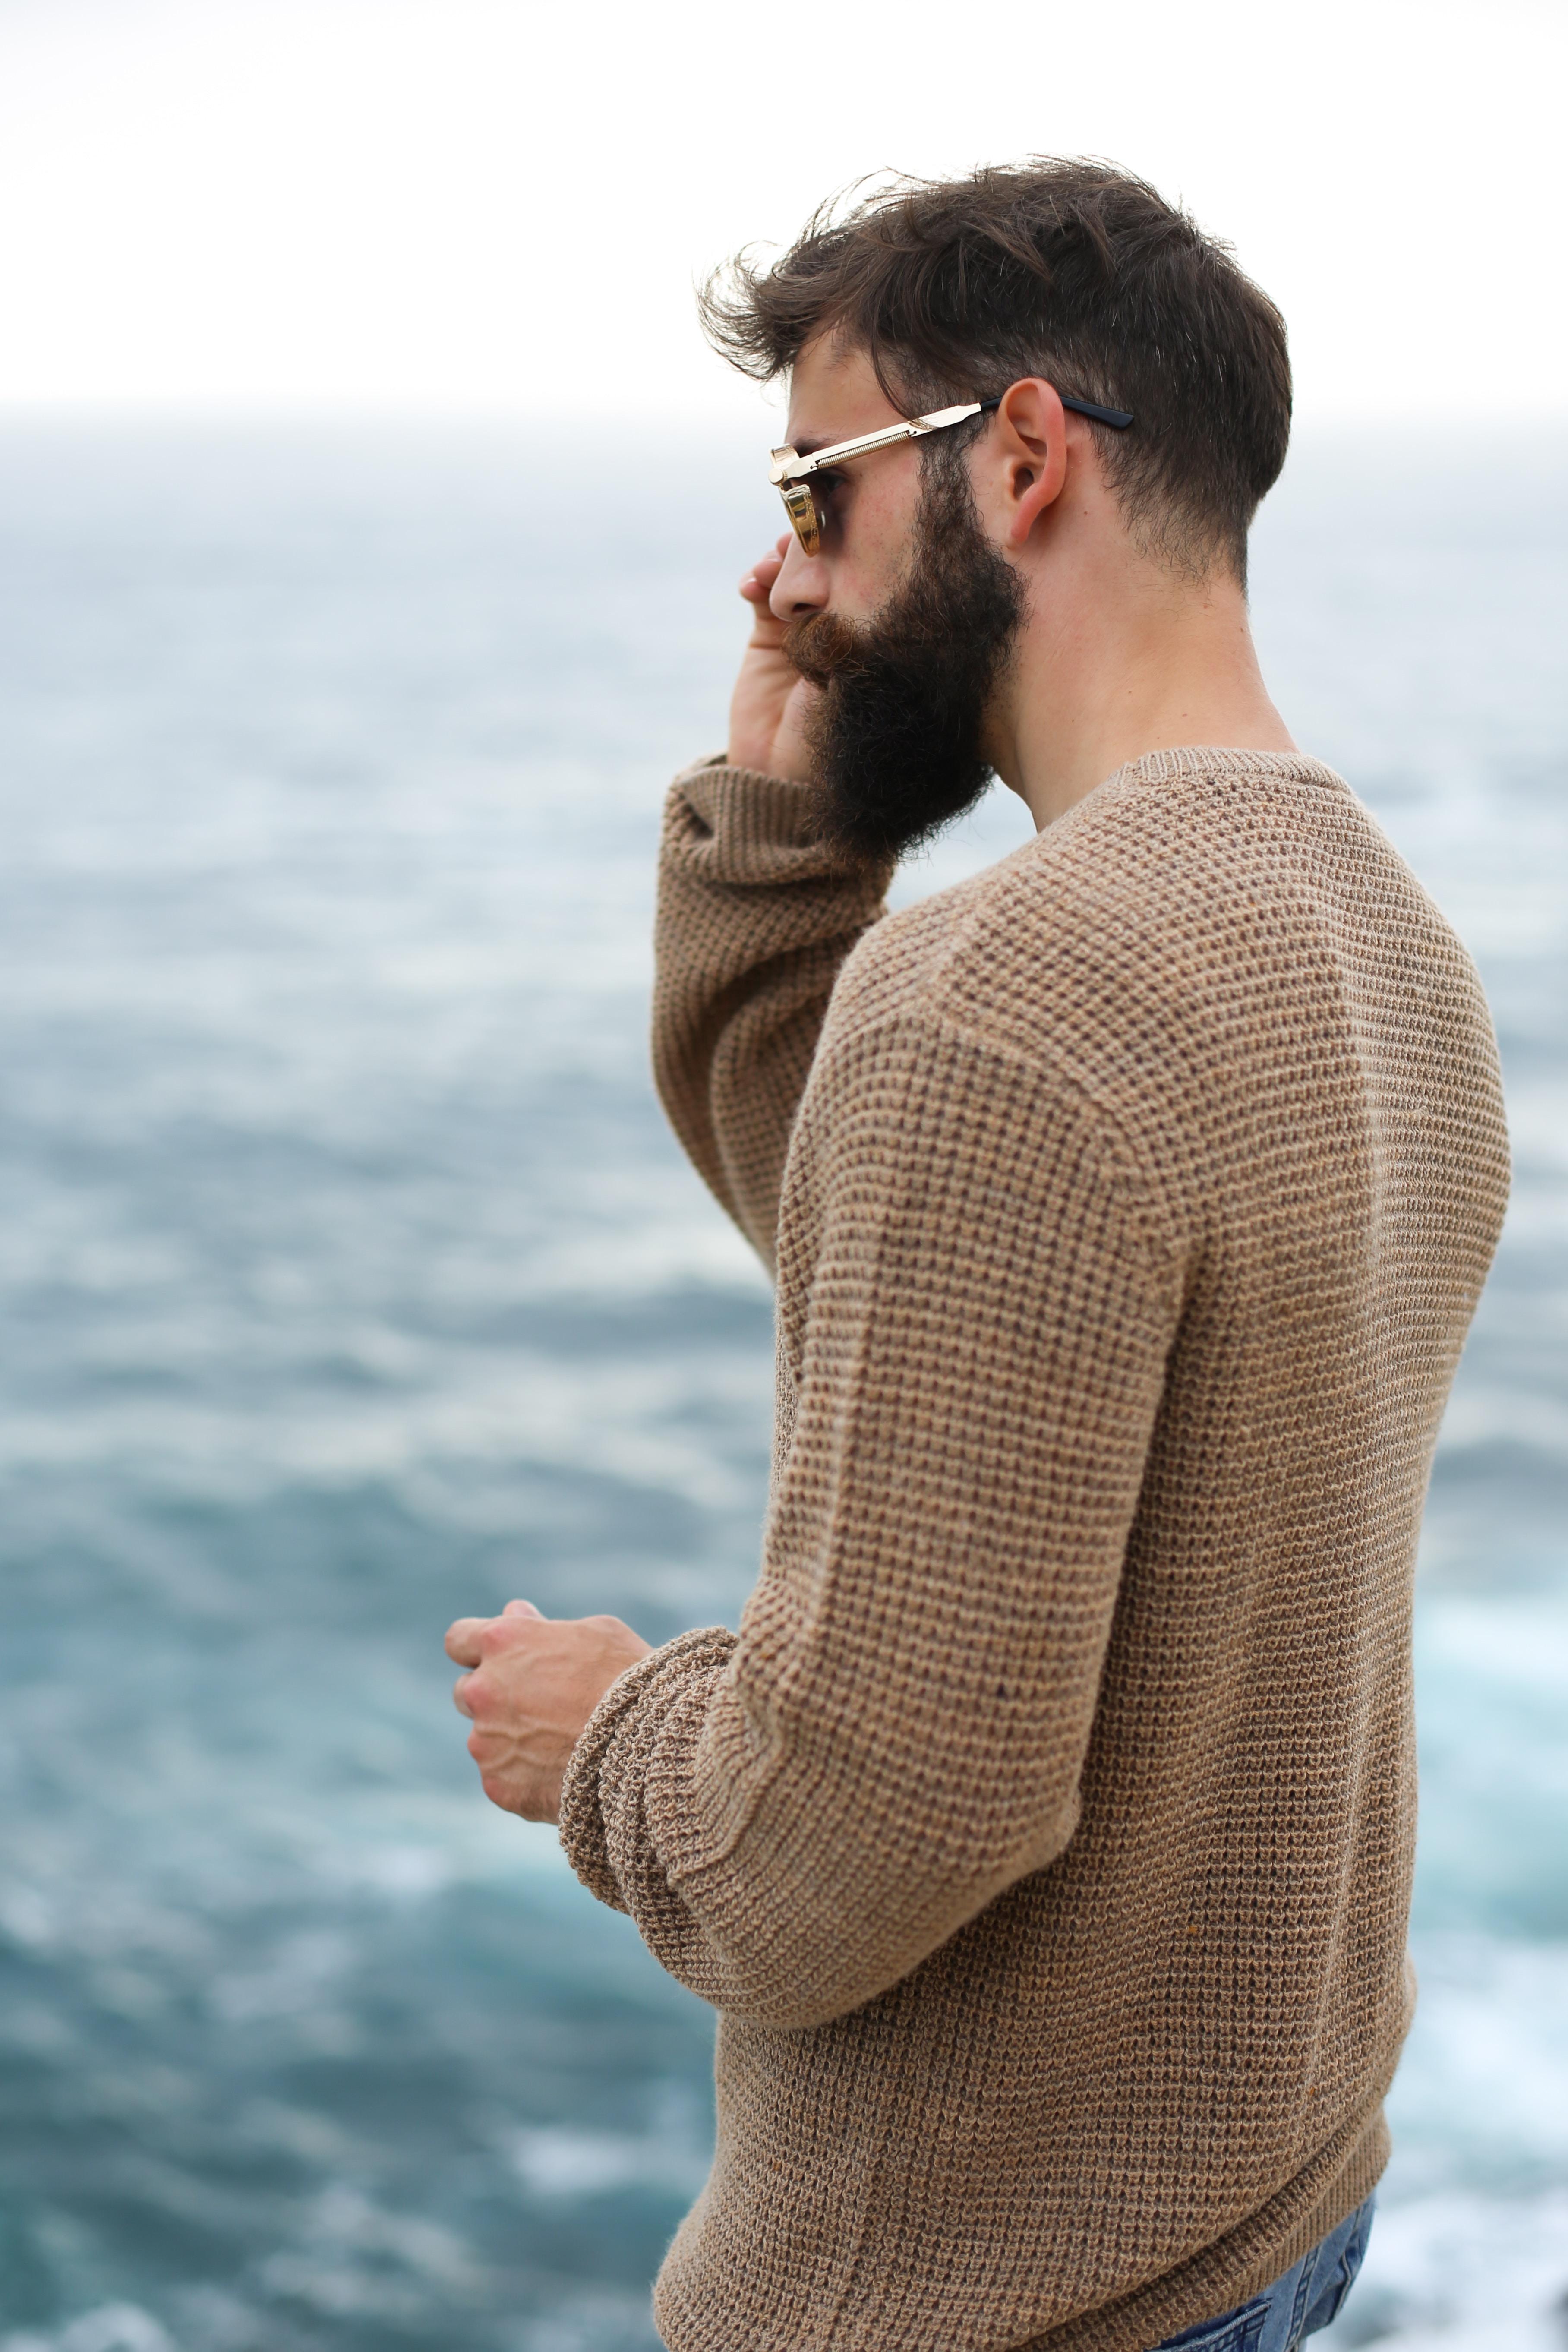 man holding his sunglasses